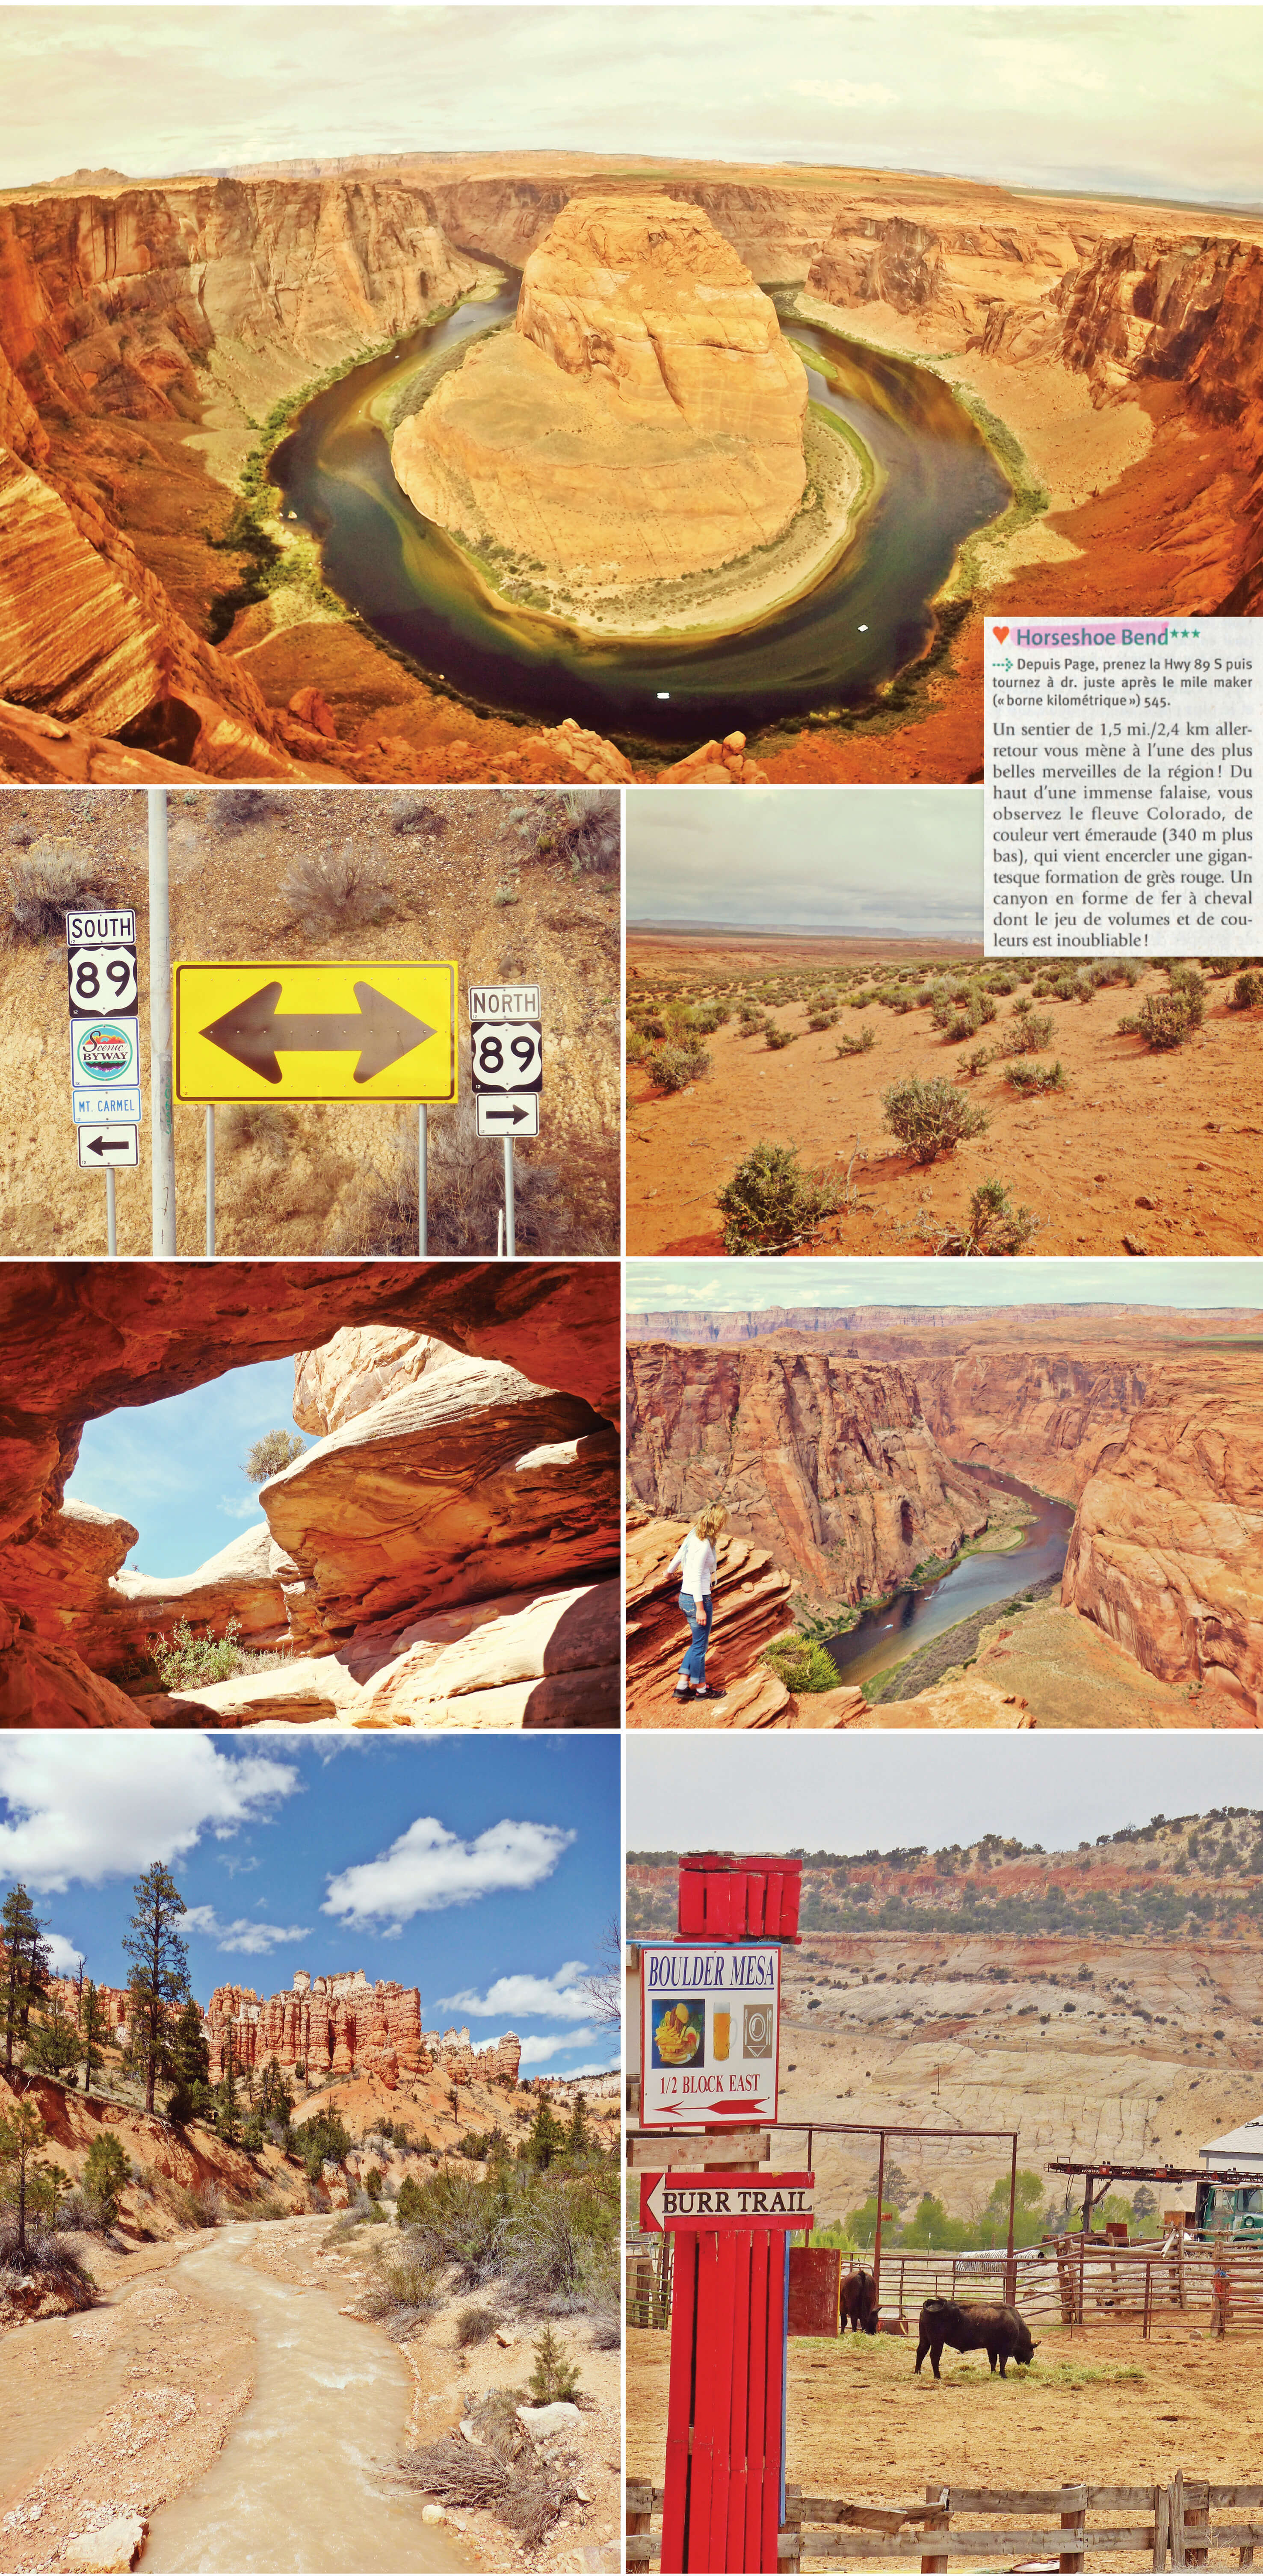 usa, utah, road trip, horseshoe bend, canyon, vache, route, voyage, désert